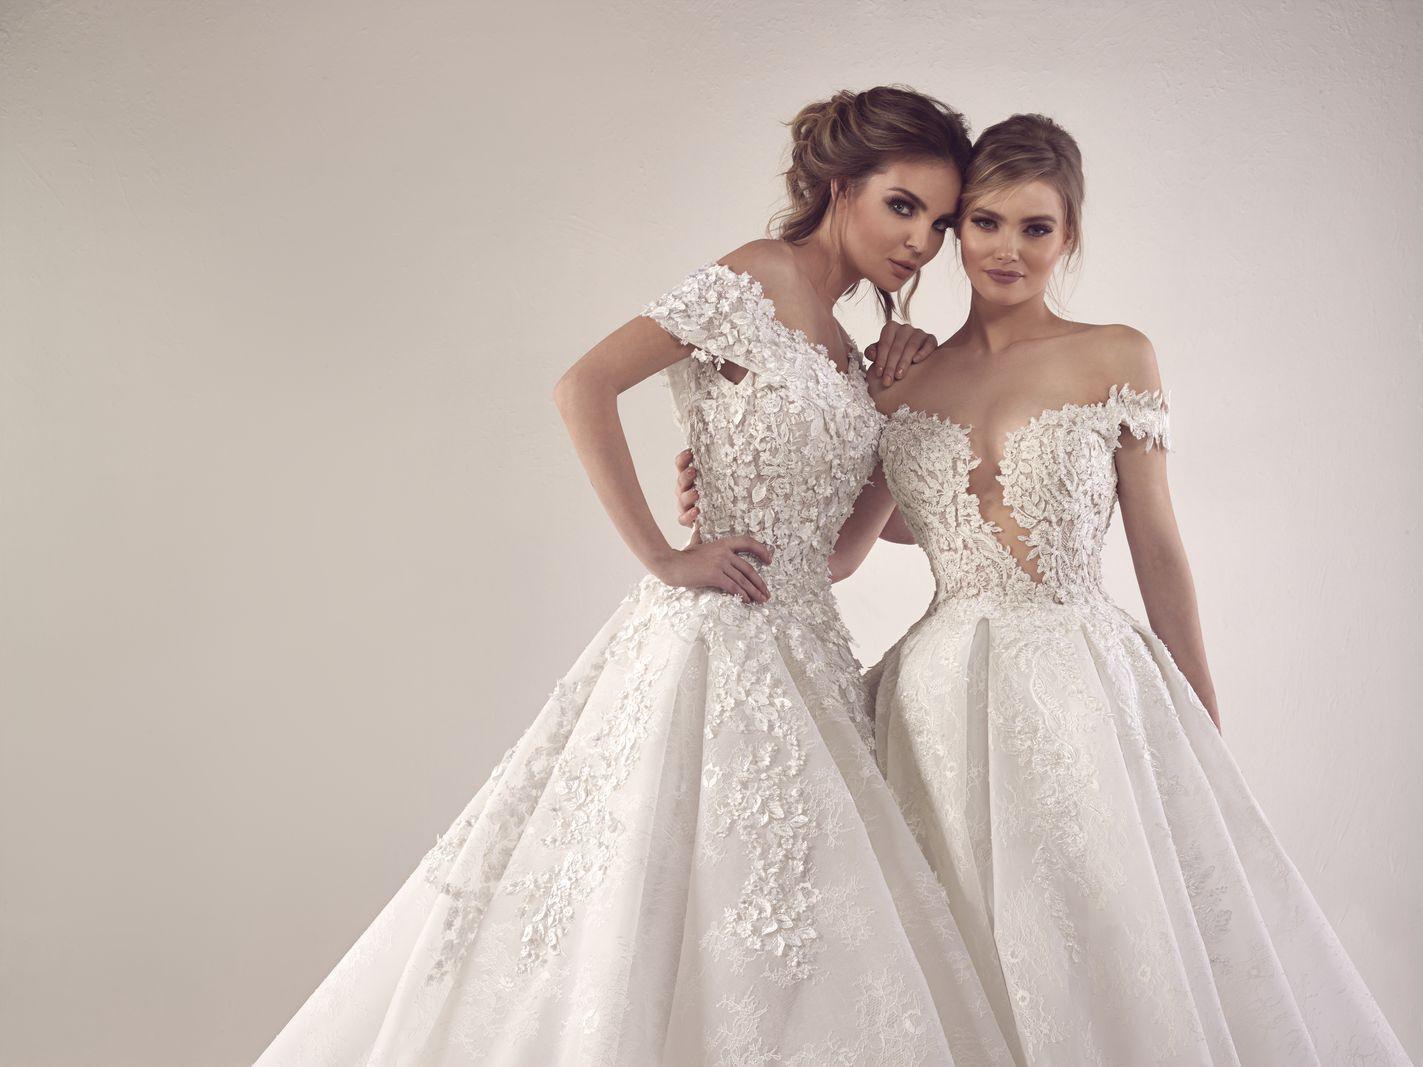 We113 2017 Mermaid Tail Wedding Dress Bridal Gown Lebanon Designer. Lebanese  Fashion Designers Wedding Dresses 0b4bcfd934db